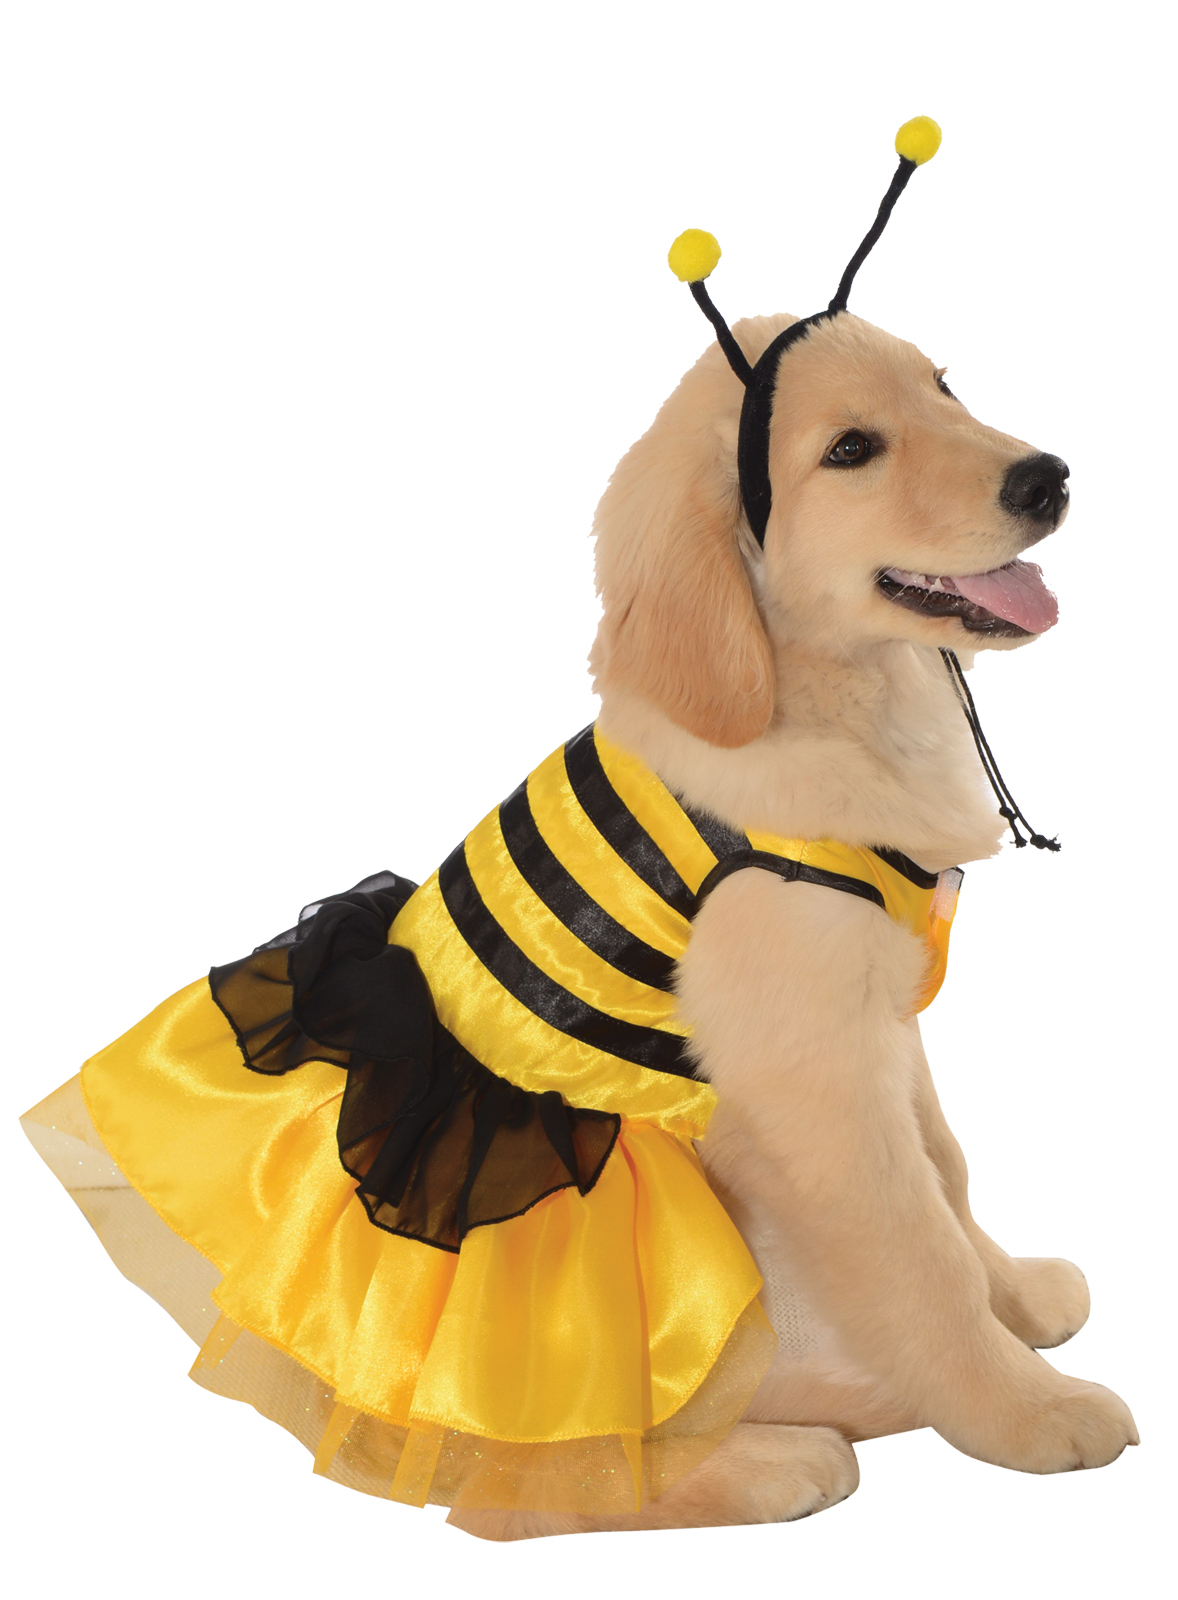 rUBIE'S COSTUME COMPANY Pet Baby Bumblebee Halloween Costume